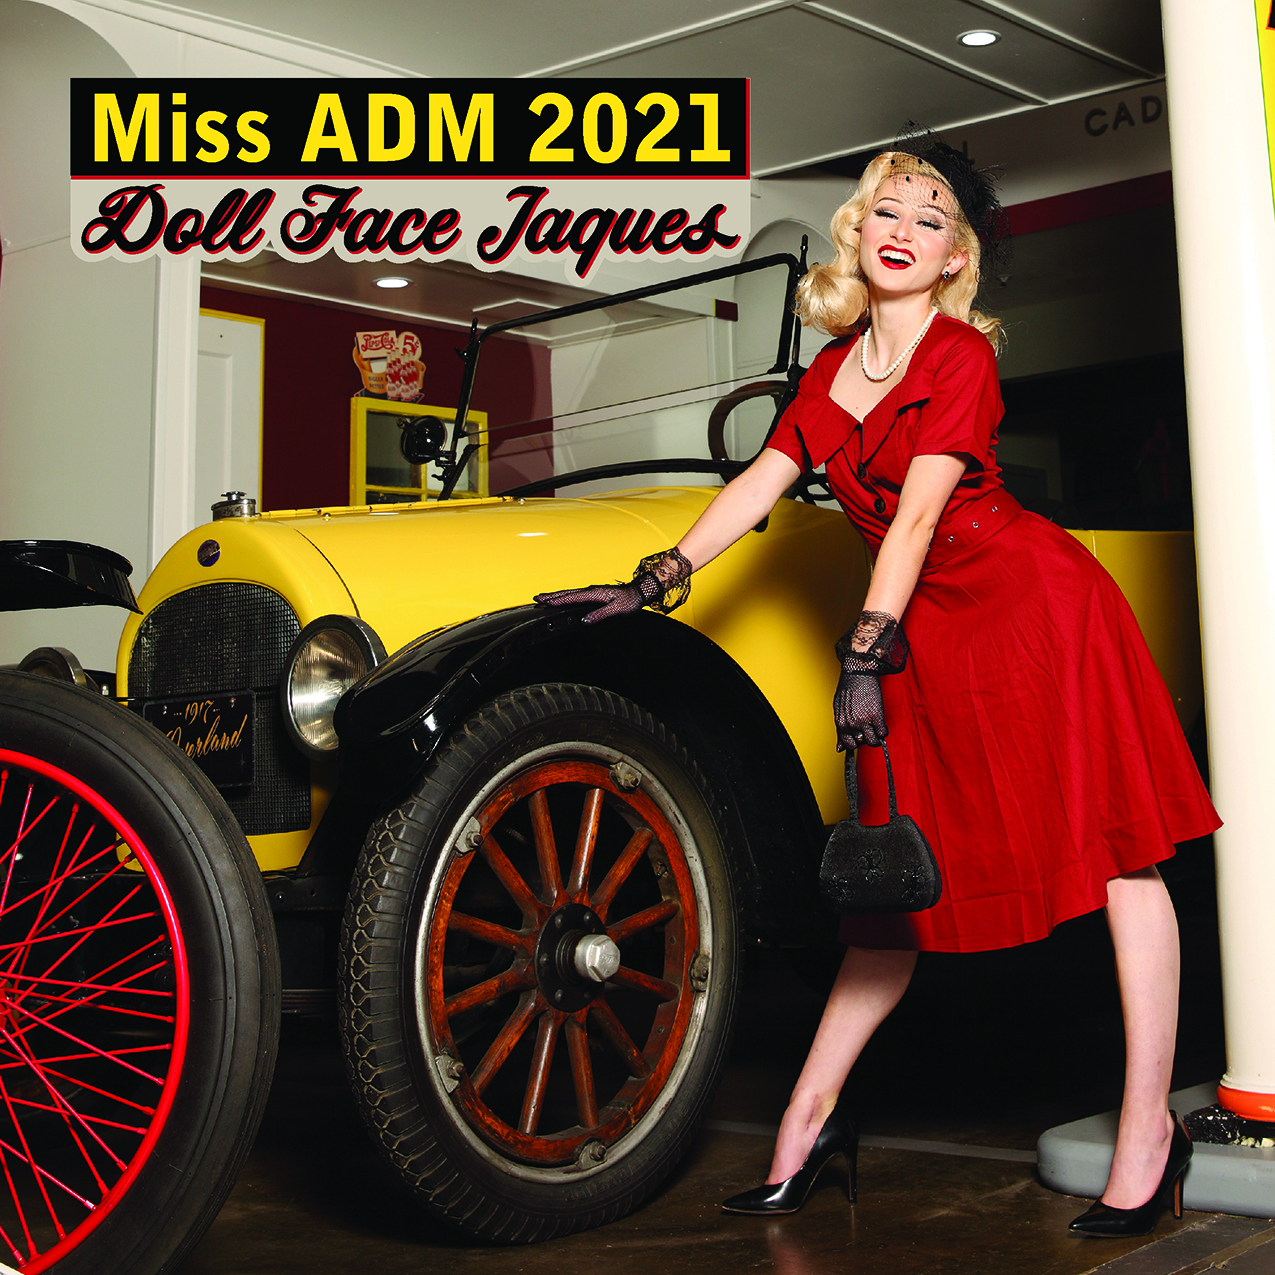 Miss ADM 2021